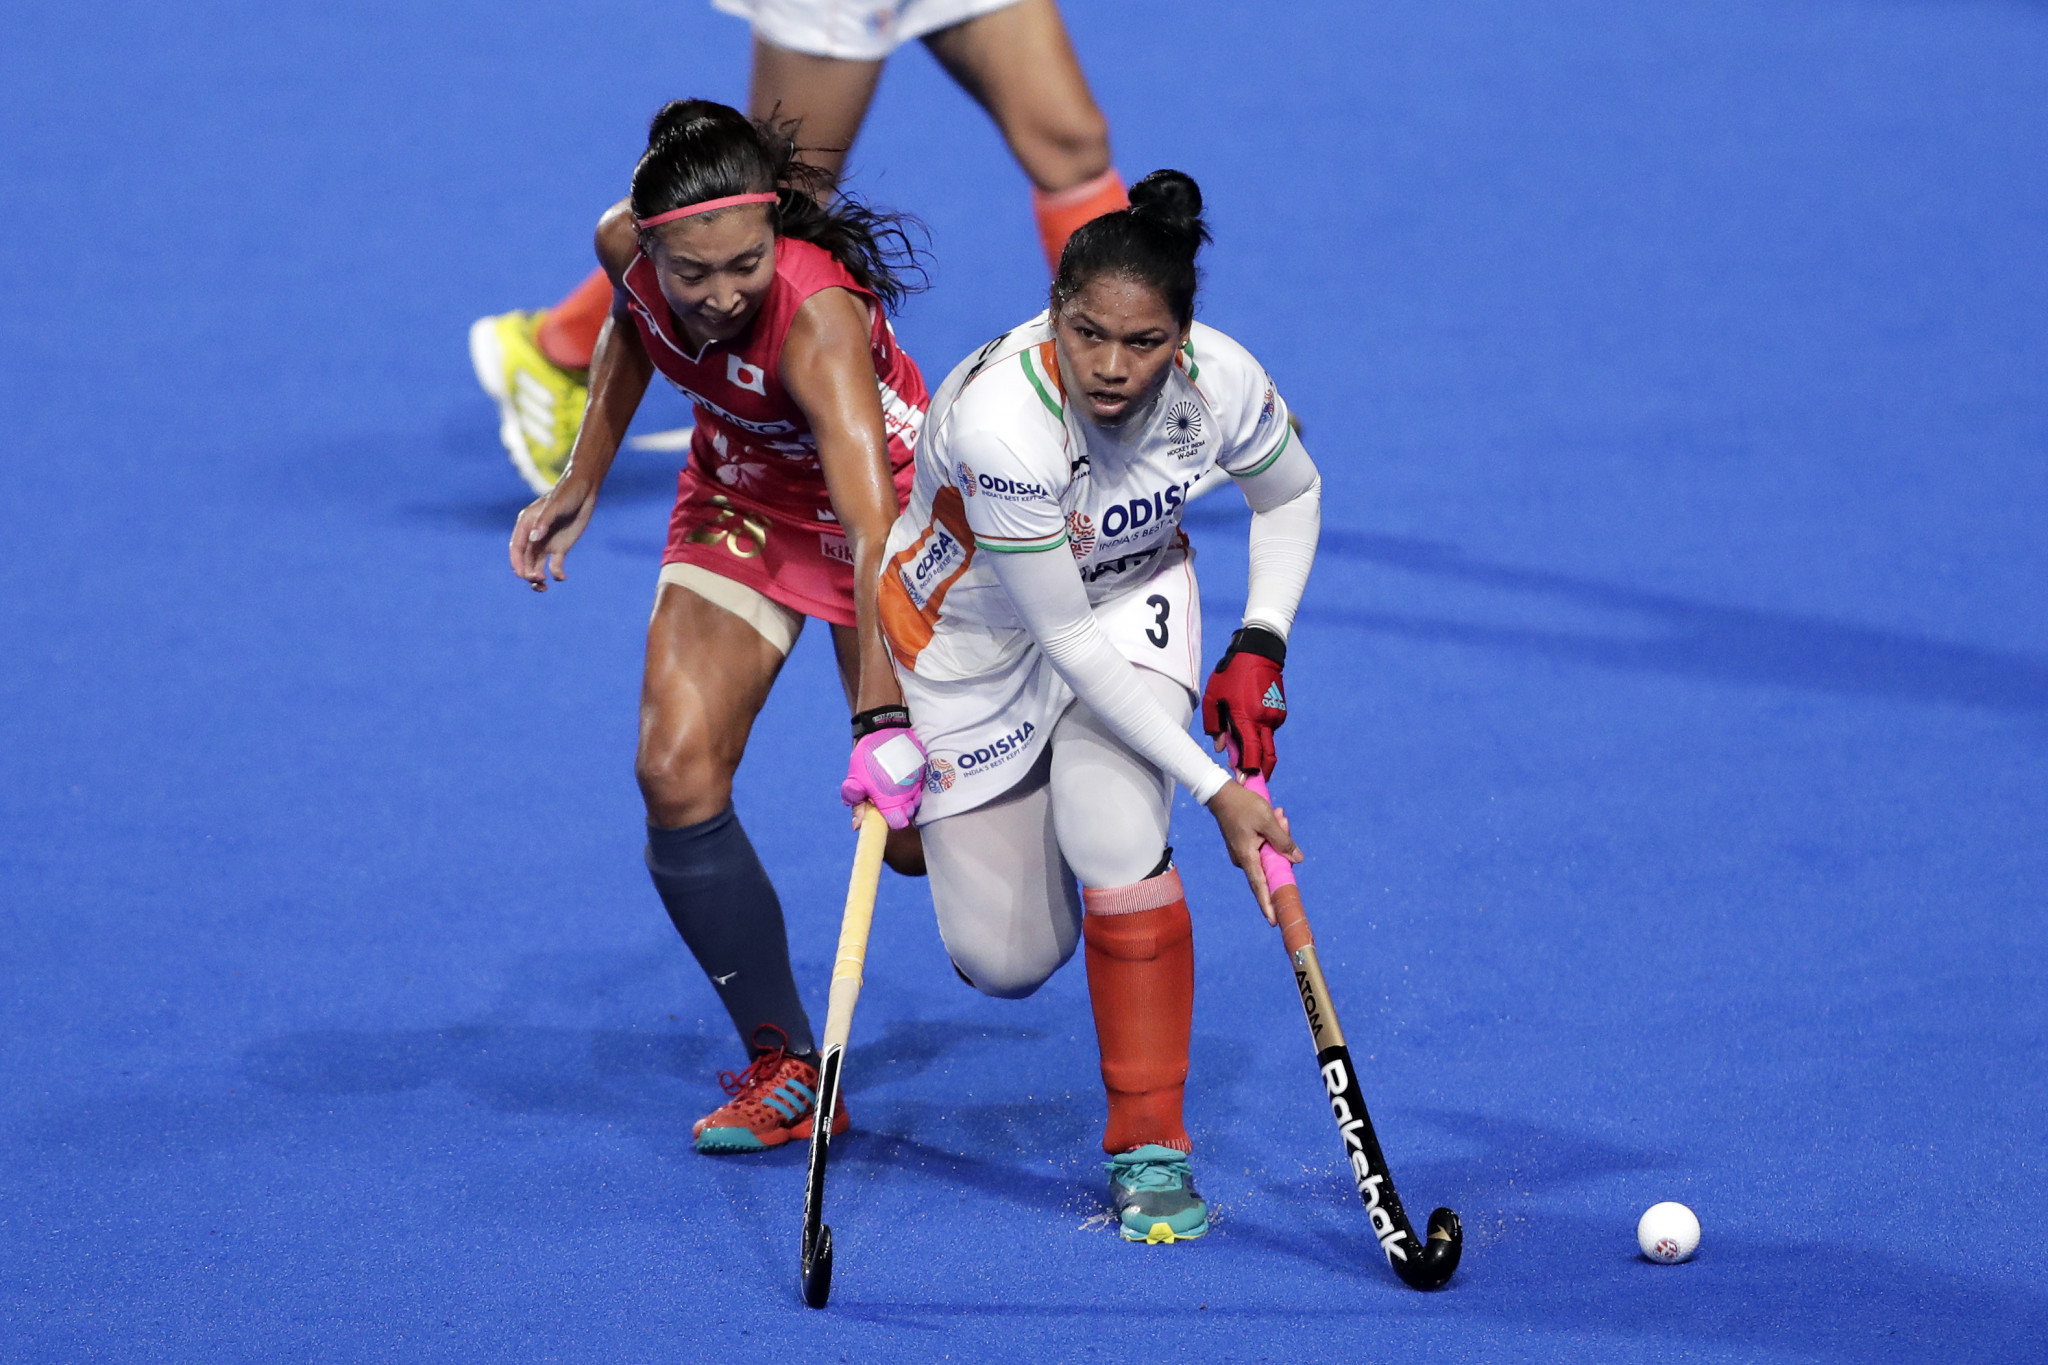 India's women's hockey tour of China cancelled due to coronavirus